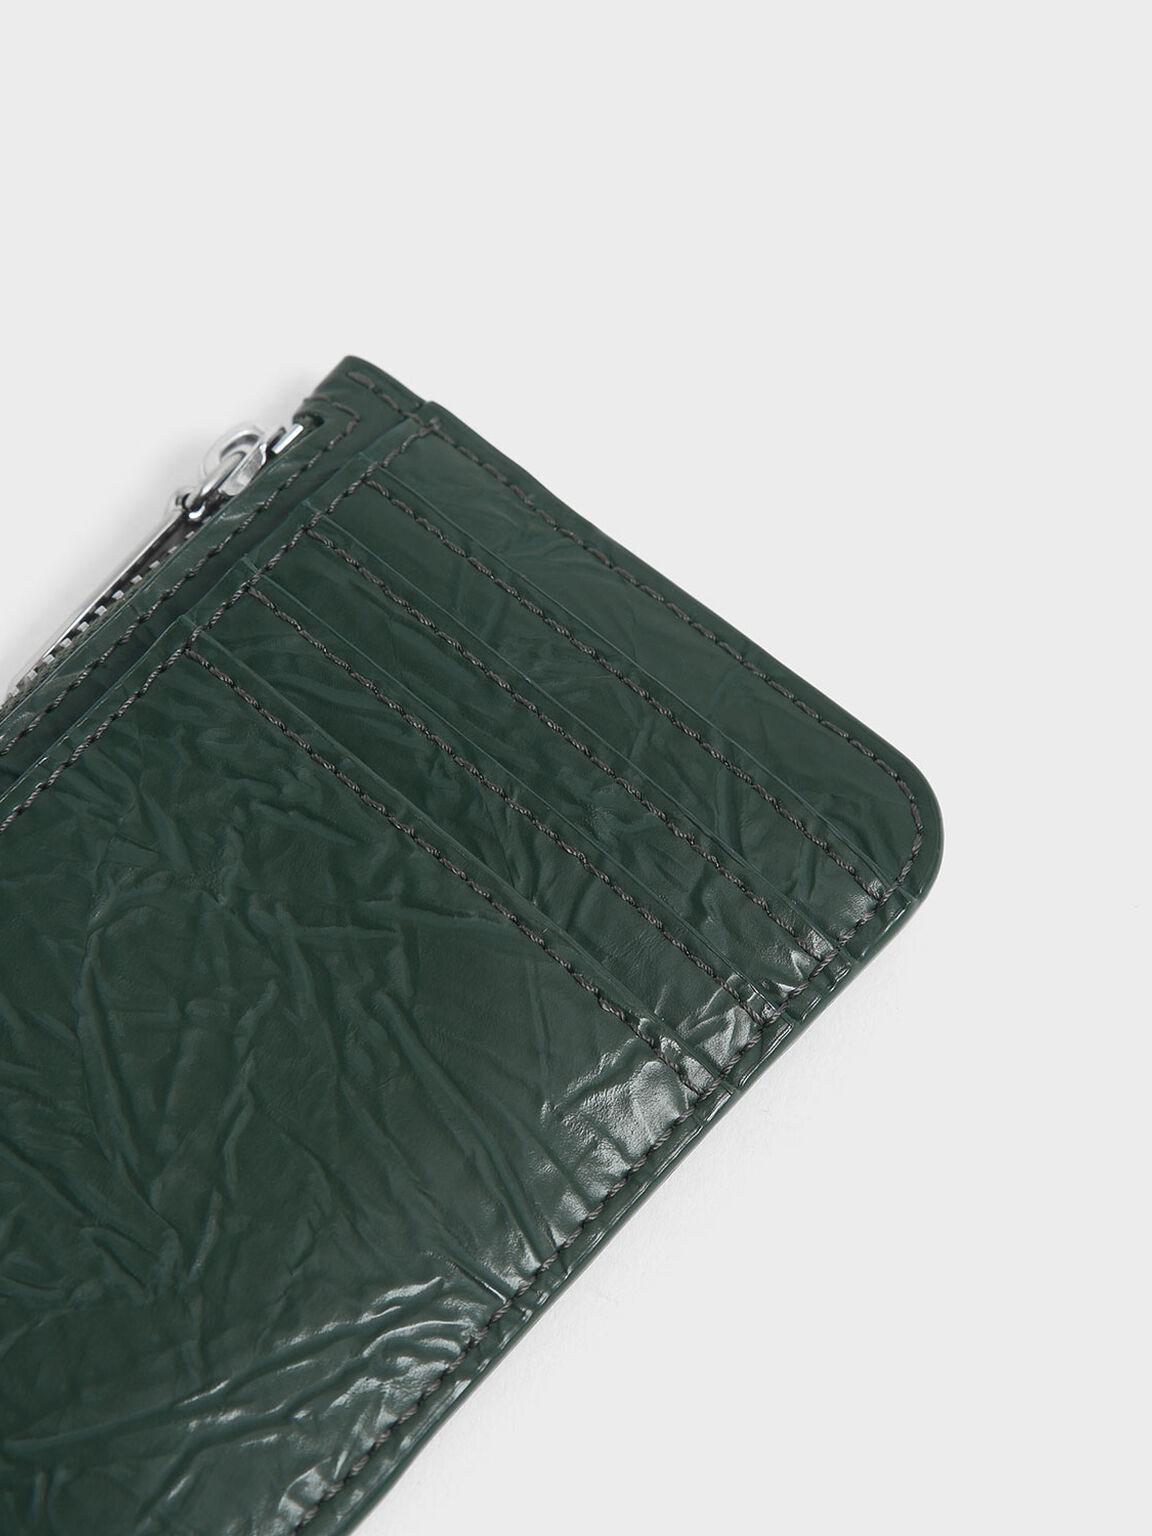 Wrinkled Effect Top Zip Cardholder, Dark Green, hi-res